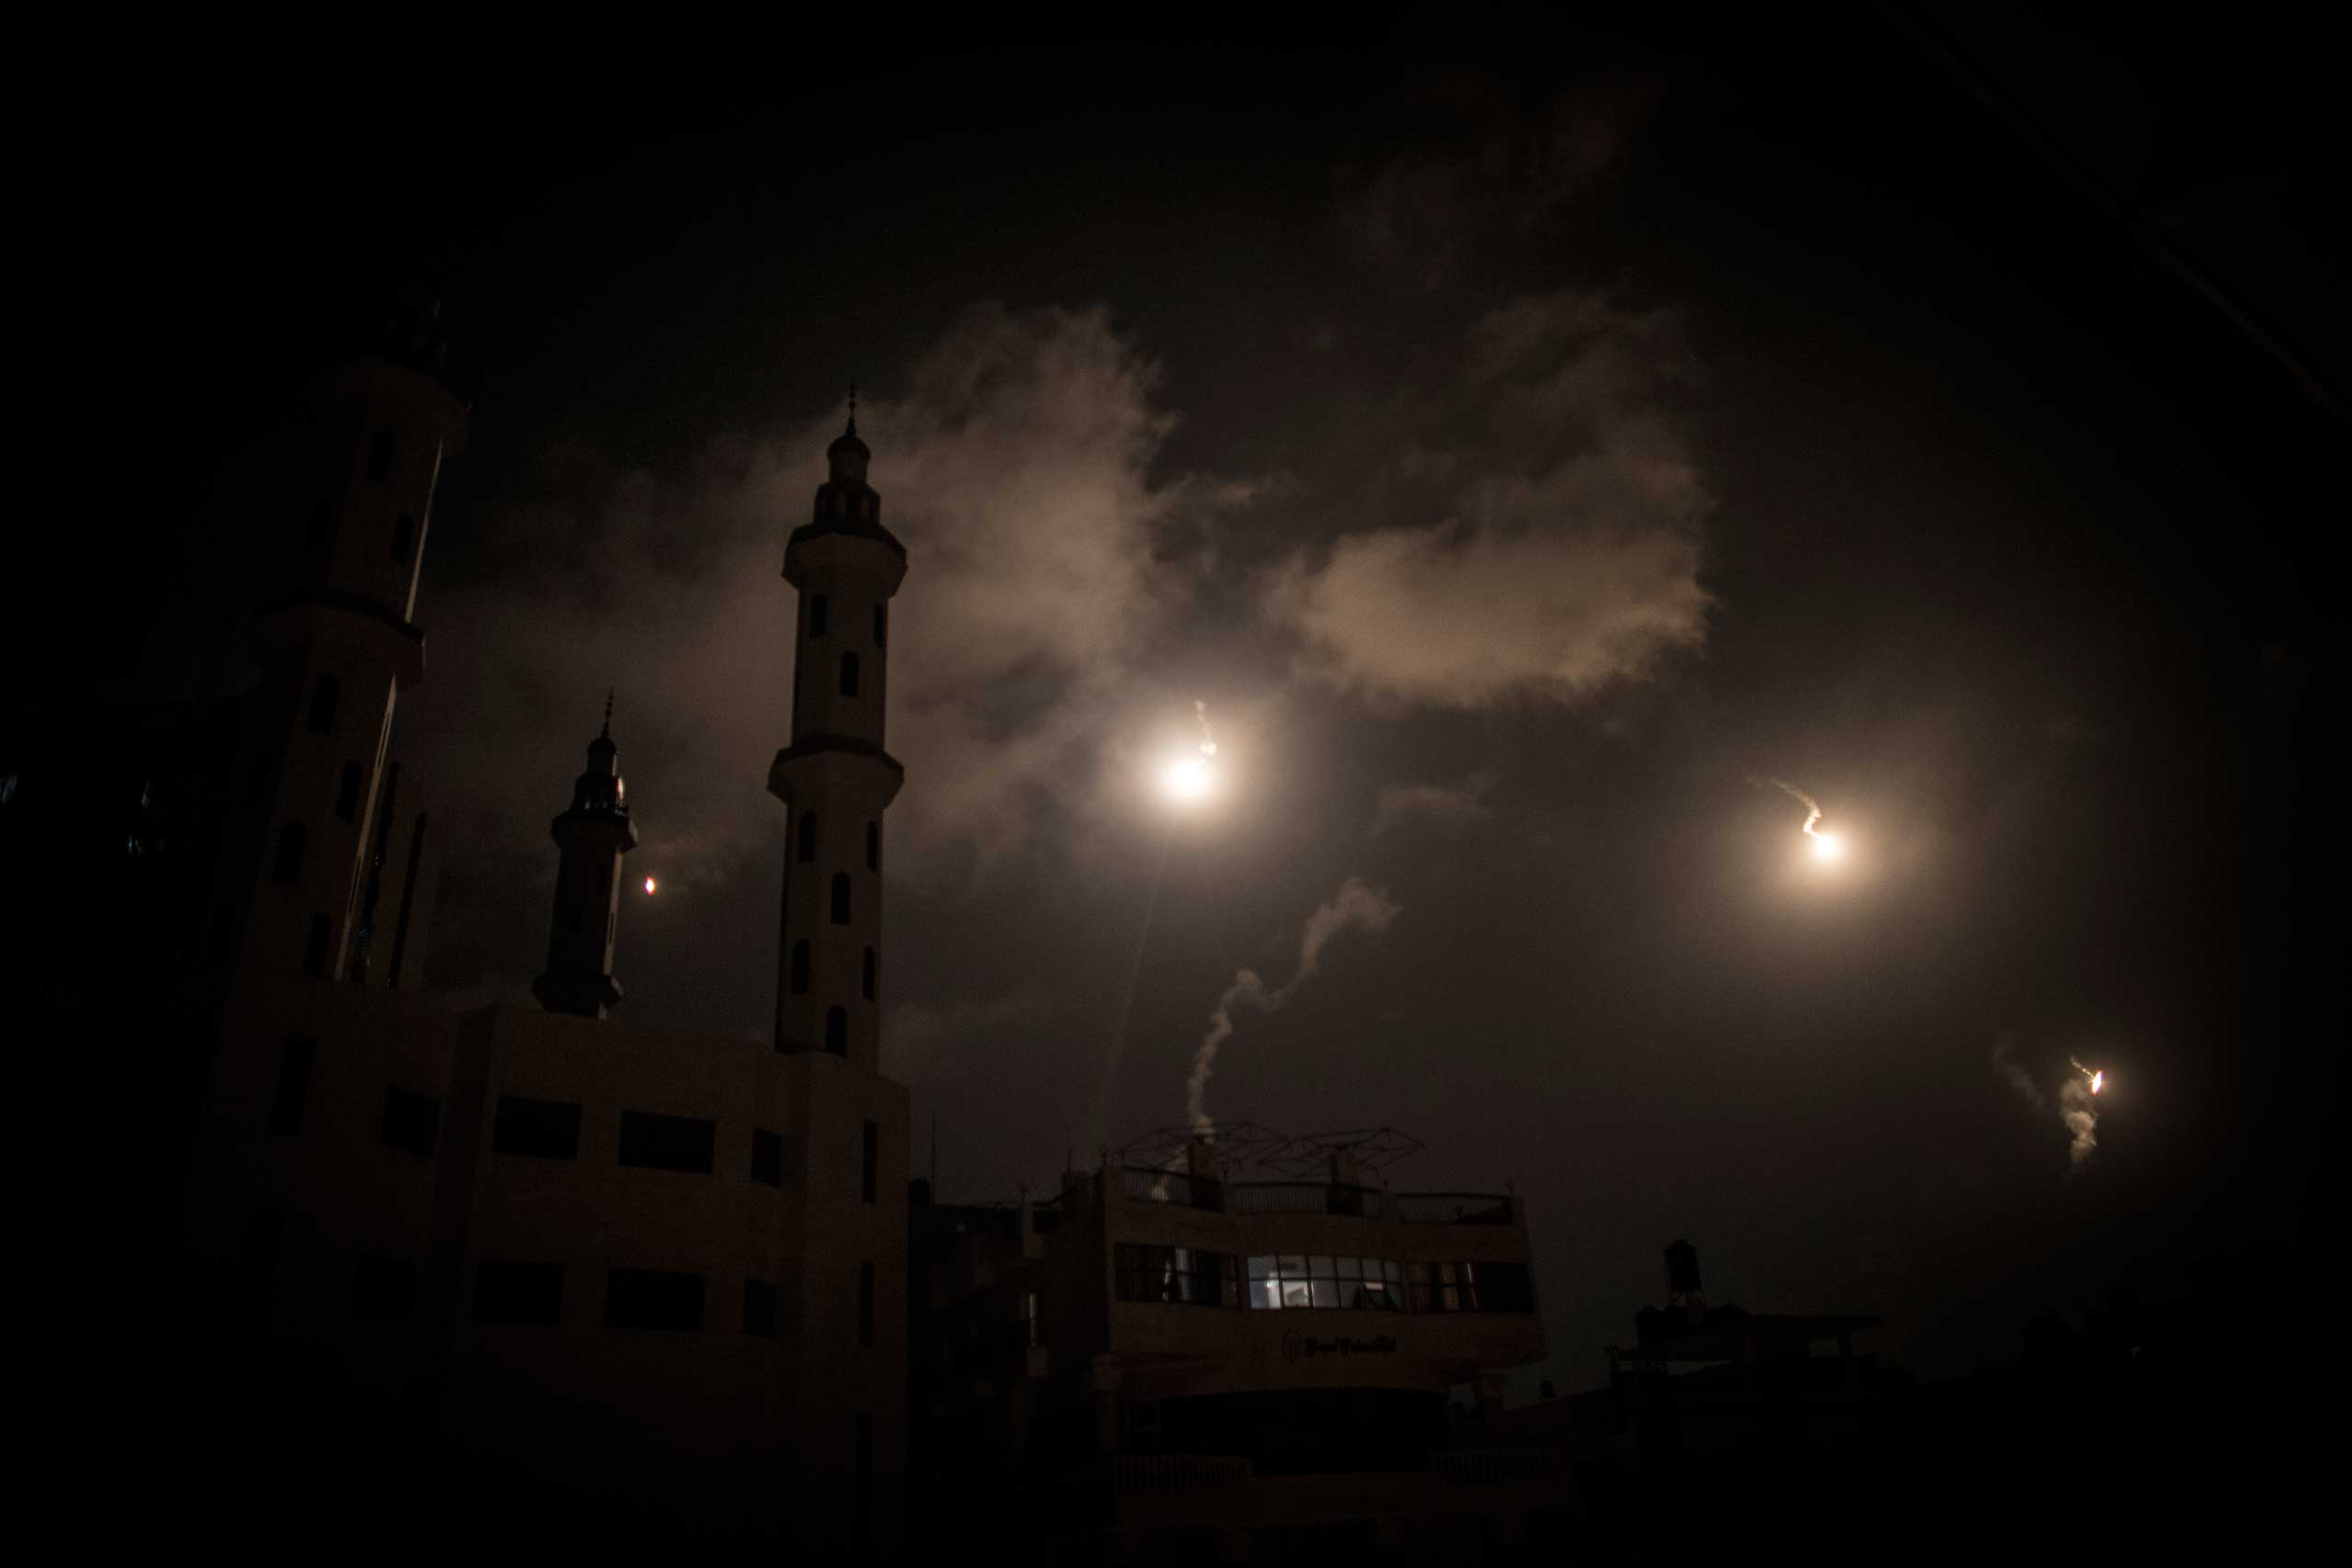 Illumination flares shot by Israel Defense Forces illuminate the minaret of a mosque, Gaza City, July 29, 2014.